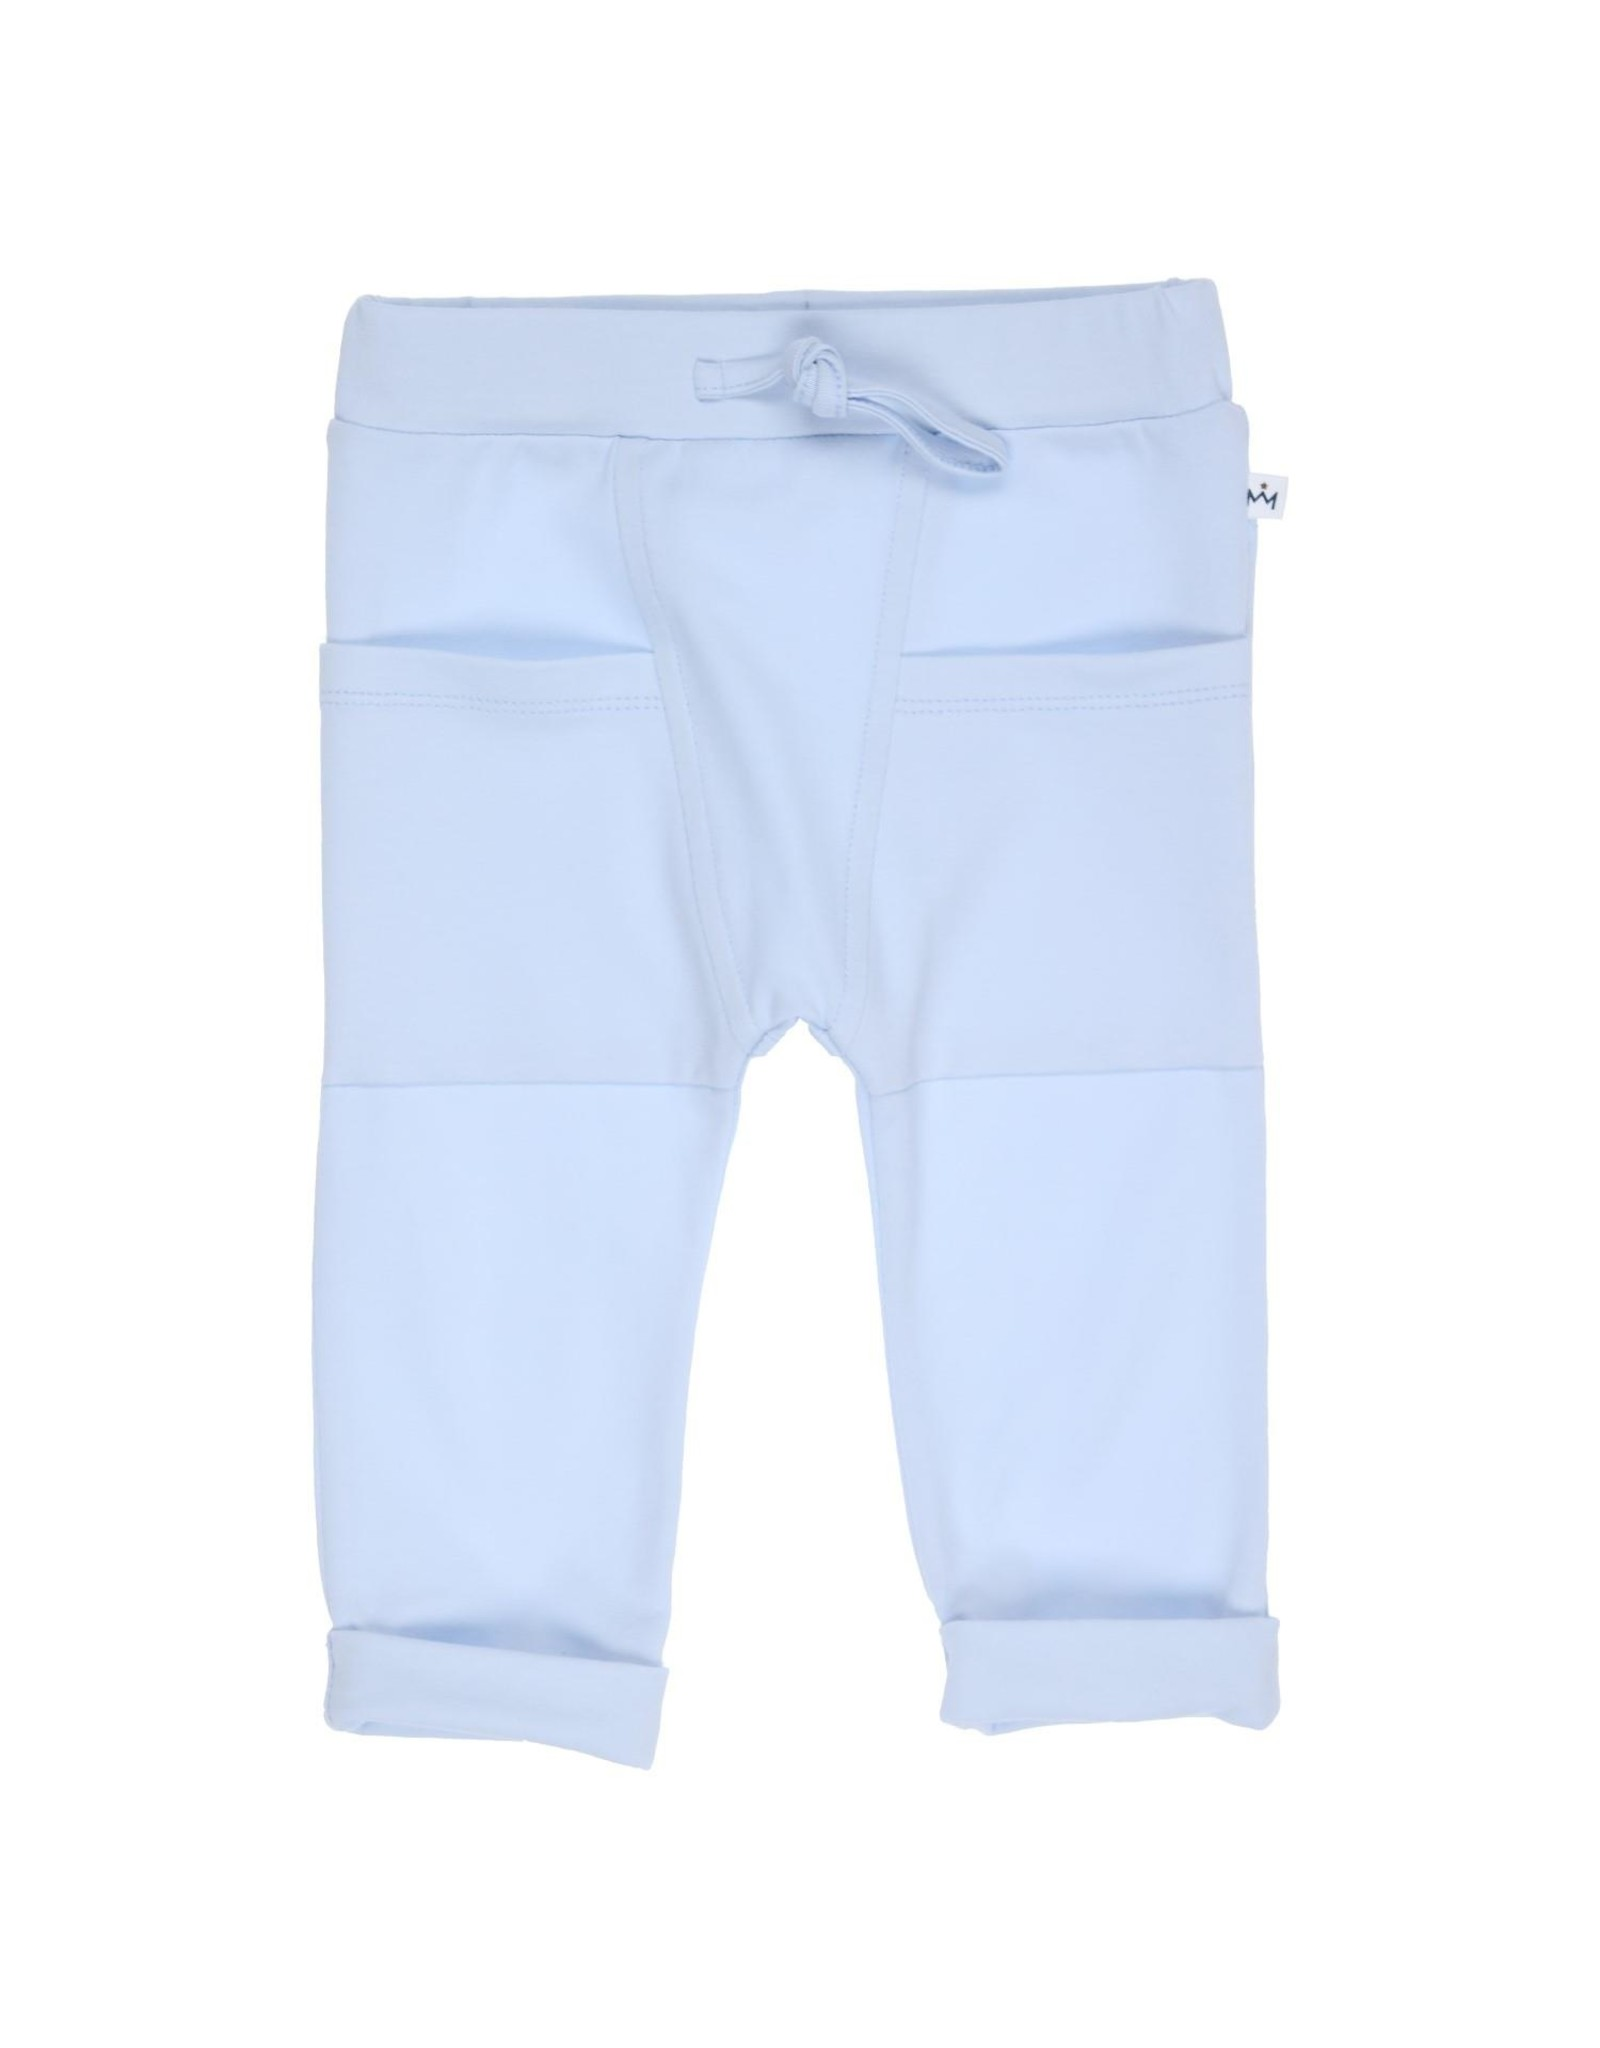 Gymp pantalon - pockets - aeromax - lichtblauw